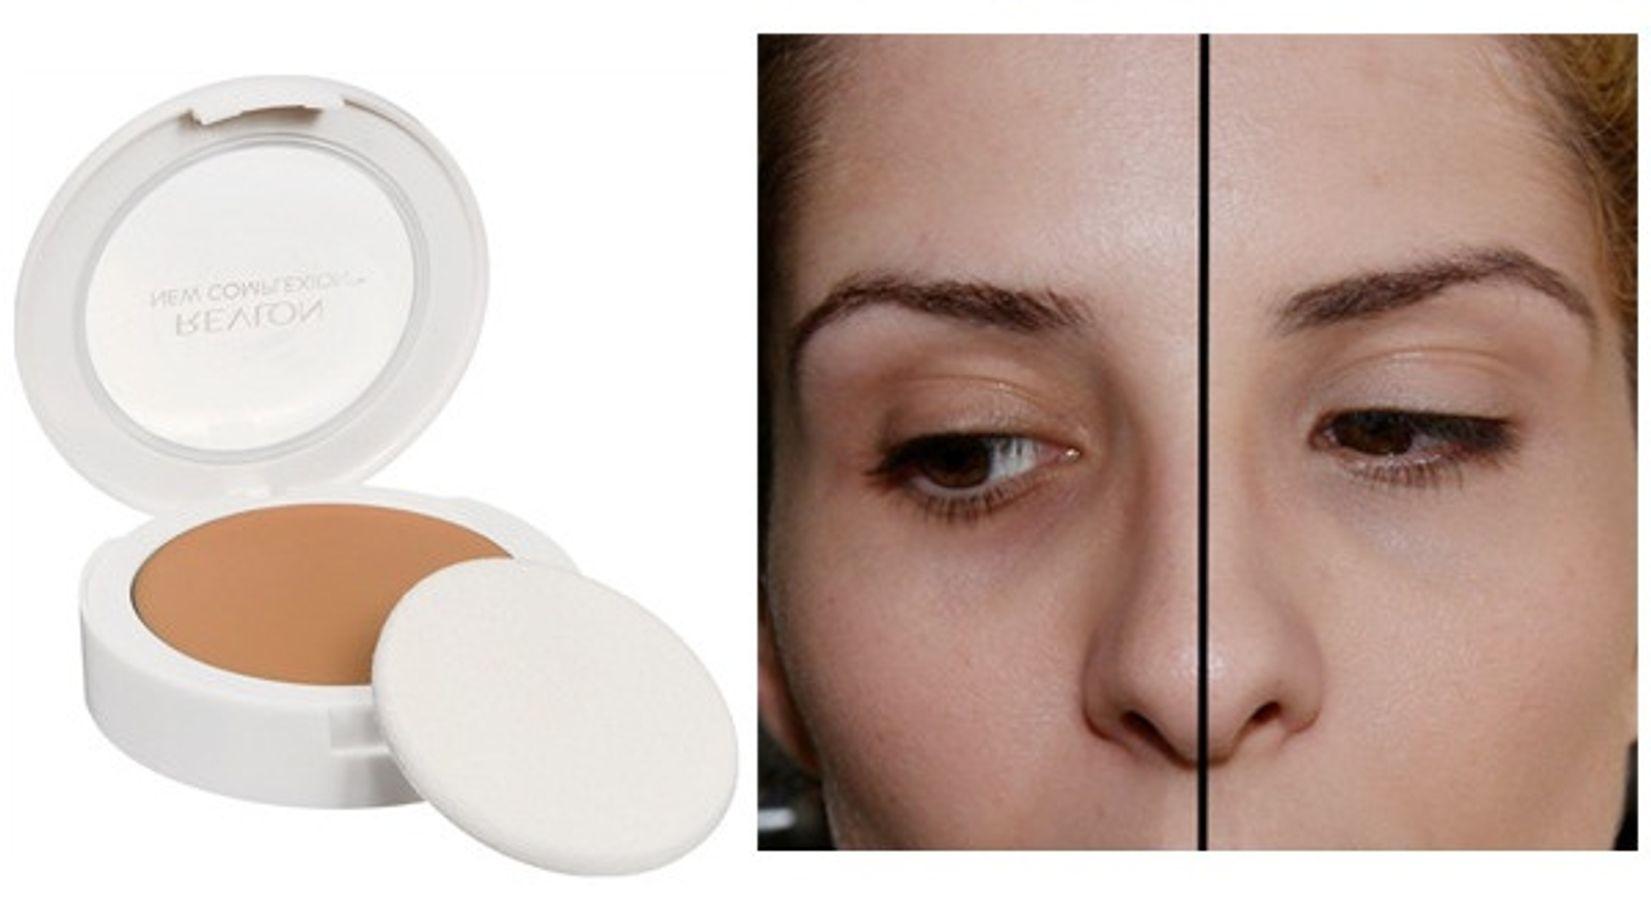 Phấn Nền Khoáng Neutrogena Skin Clearing Mineral Powder